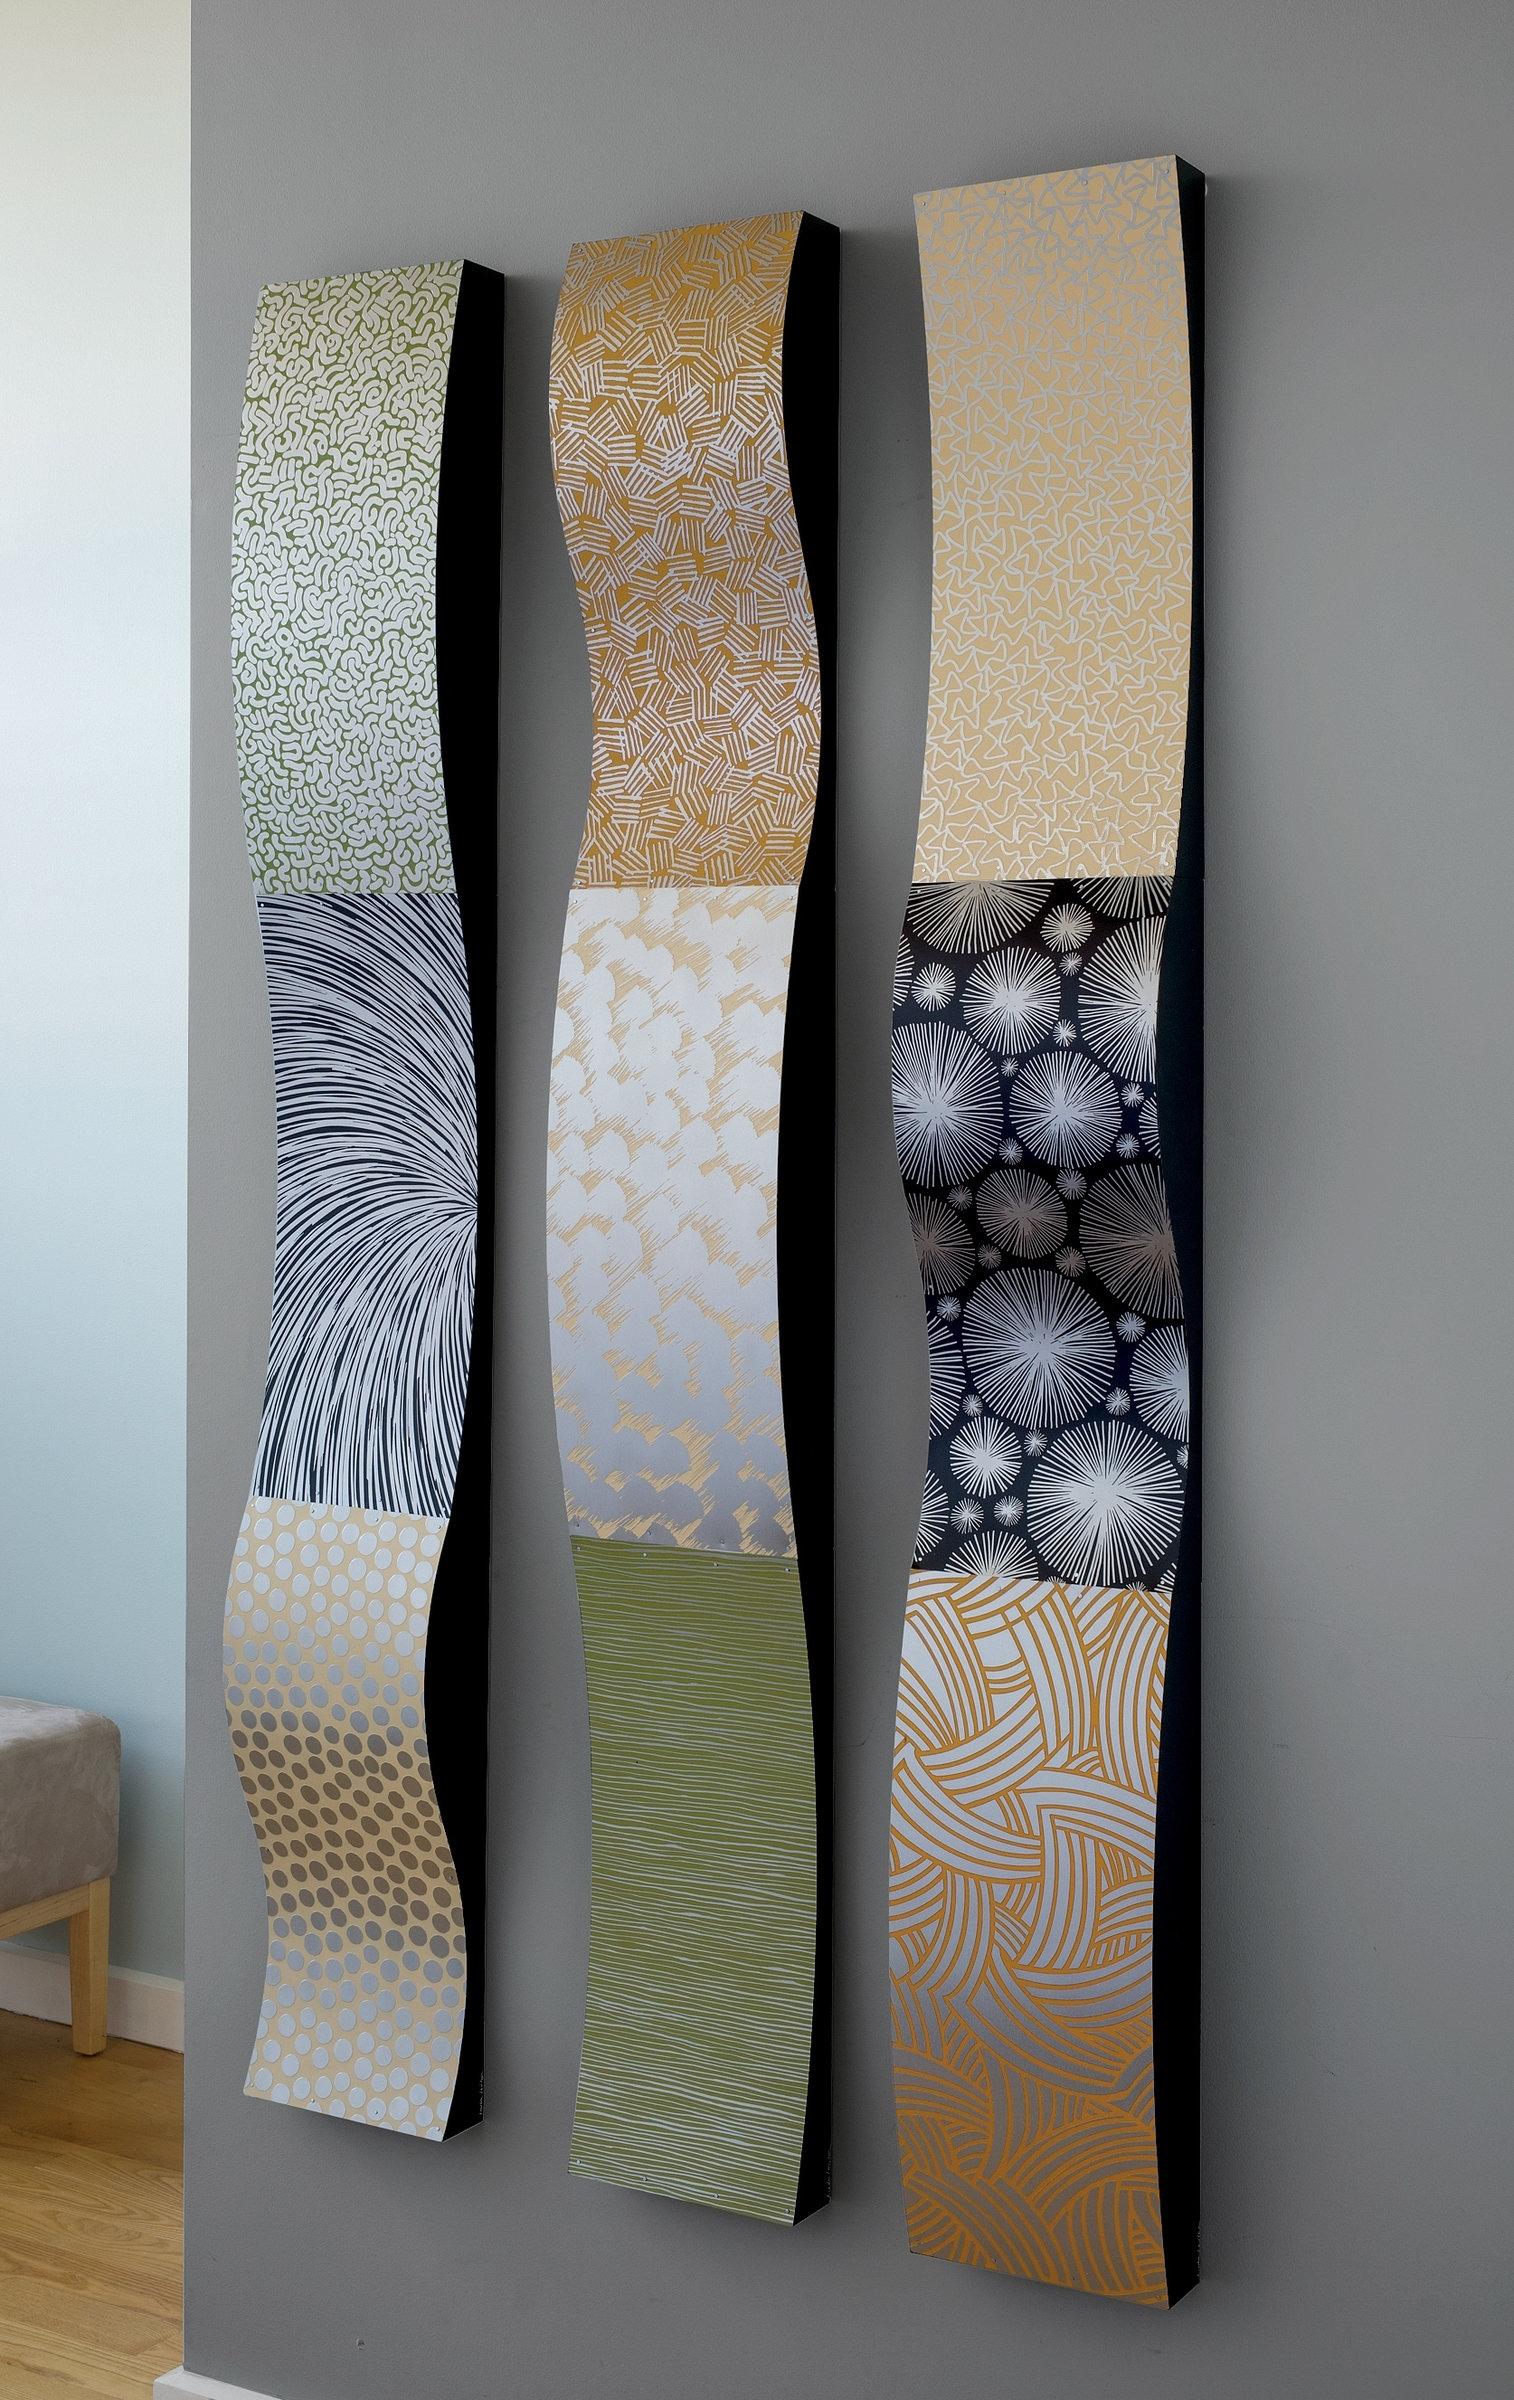 Wall Art Design Ideas: Stainless Ribbons Sculpture Wall Art Inside 2017 Abstract Kitchen Wall Art (View 15 of 20)